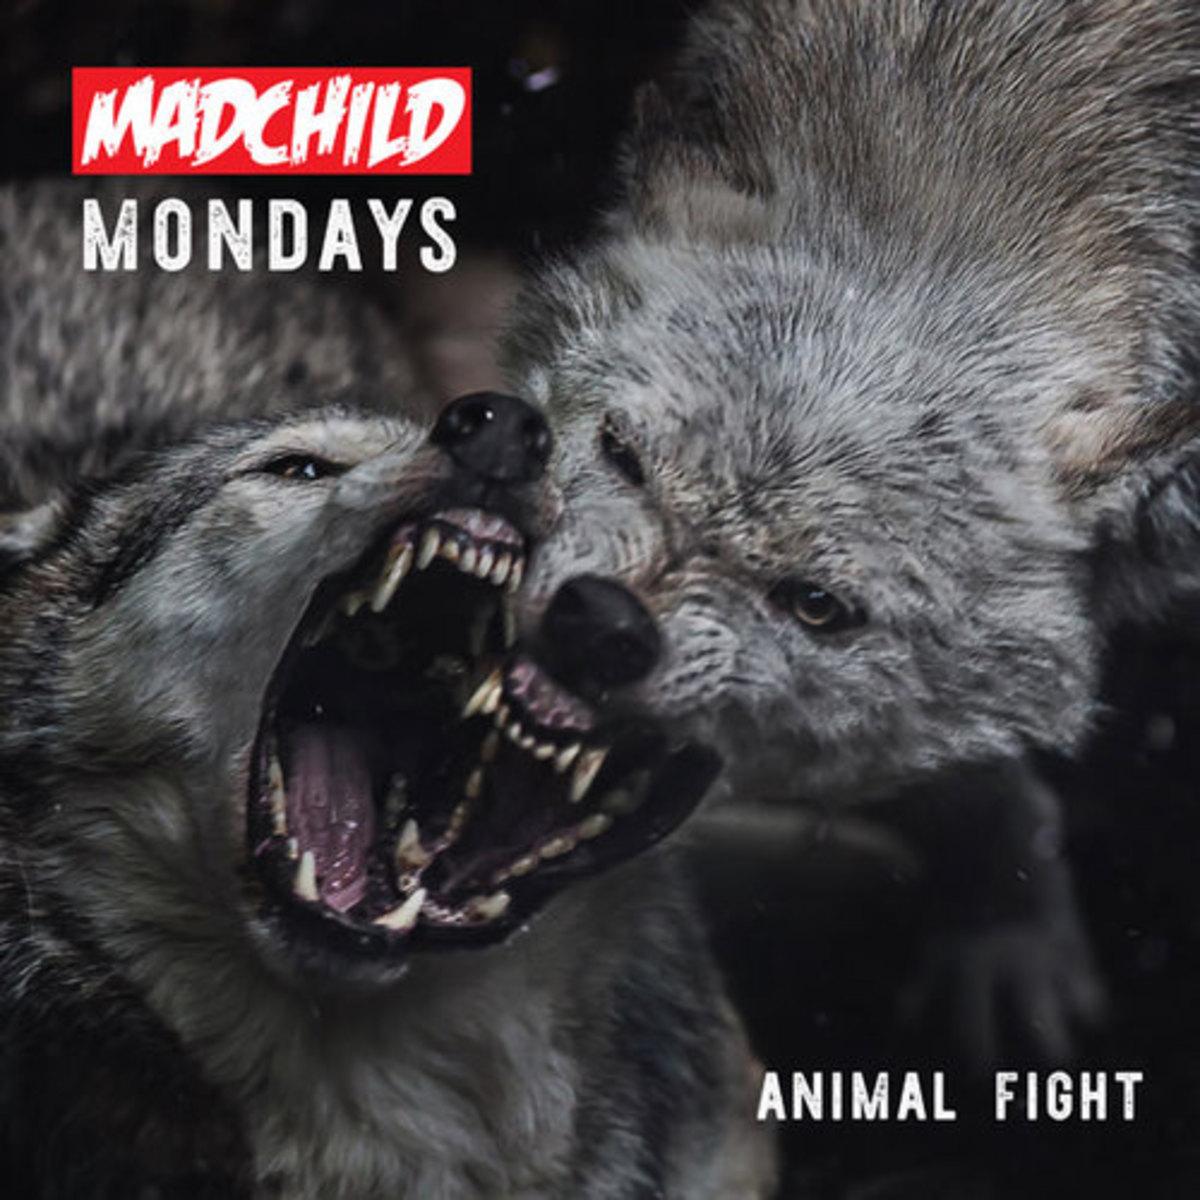 madchild-animal-fight.jpg